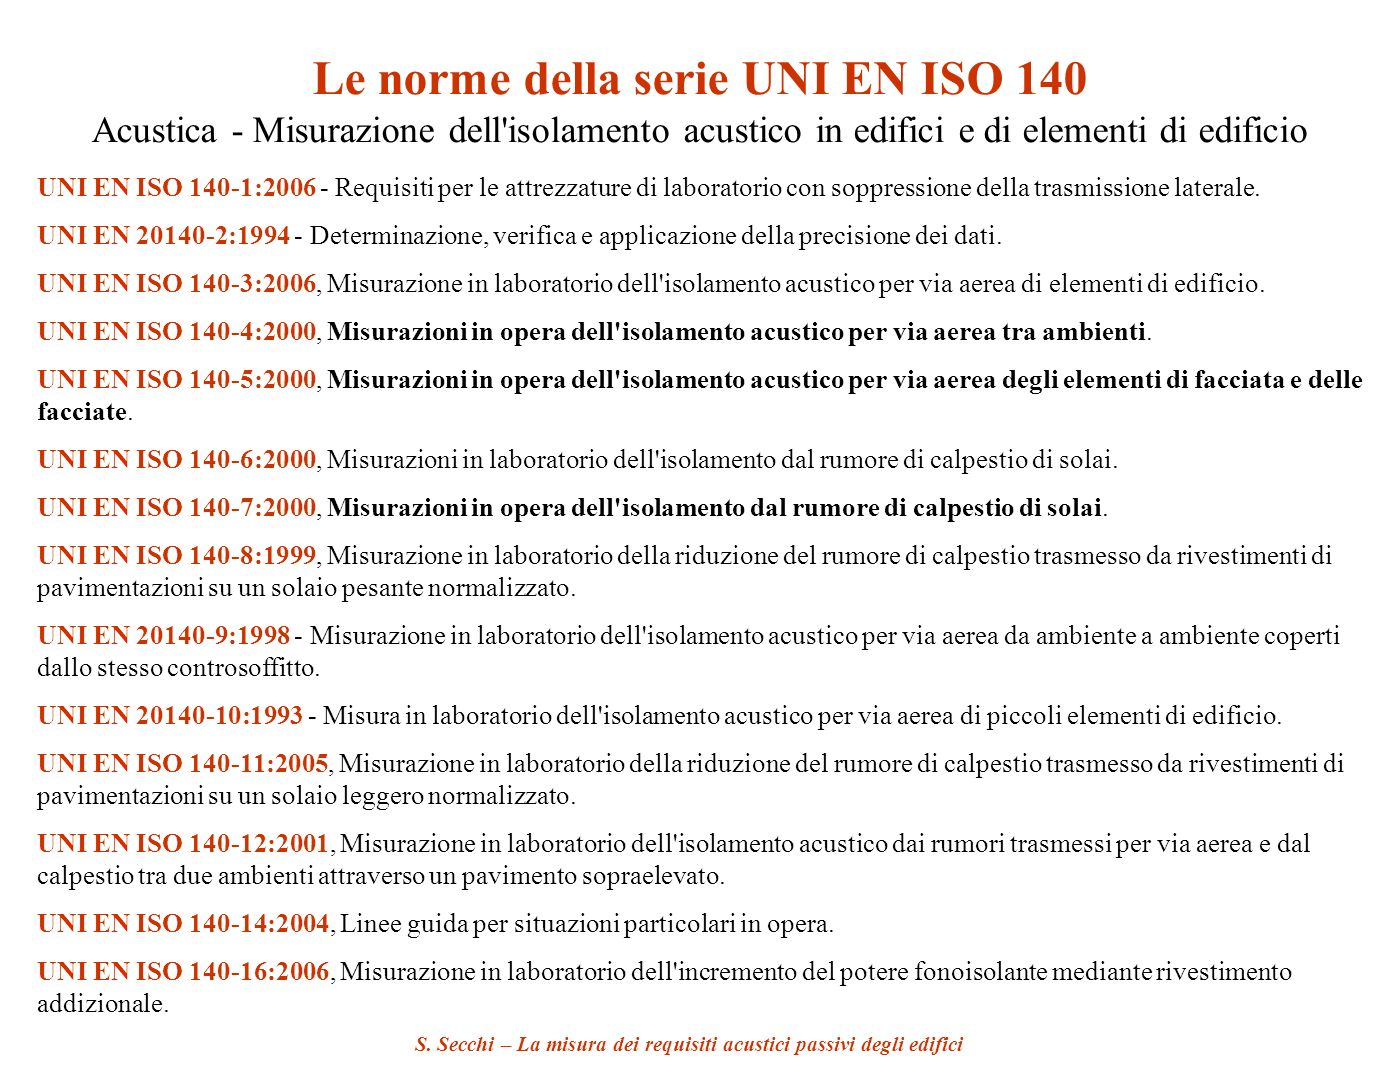 Le norme della serie UNI EN ISO 140